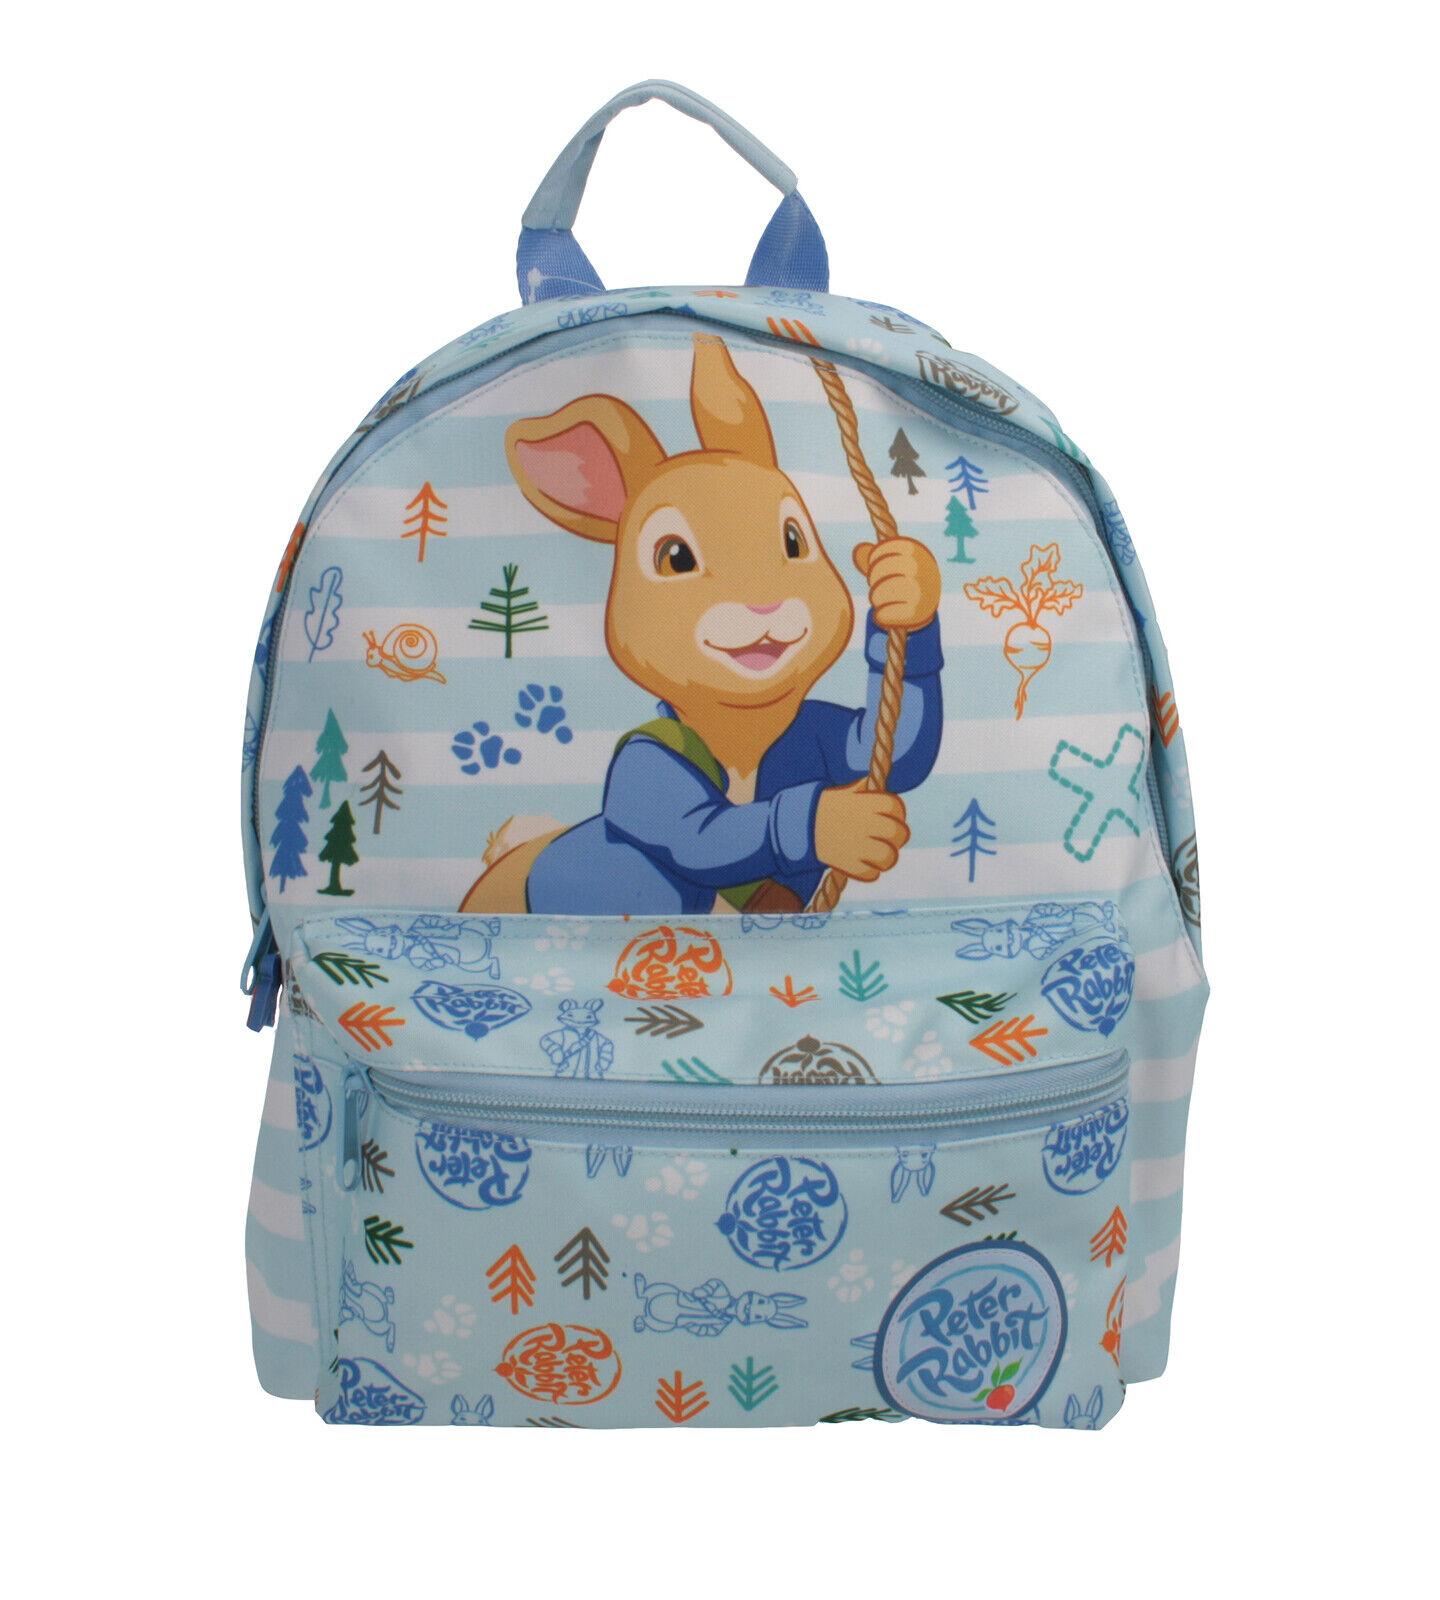 Peter Rabbit Girls Mini Roxy School Bag Rucksack Backpack Brand New Gift